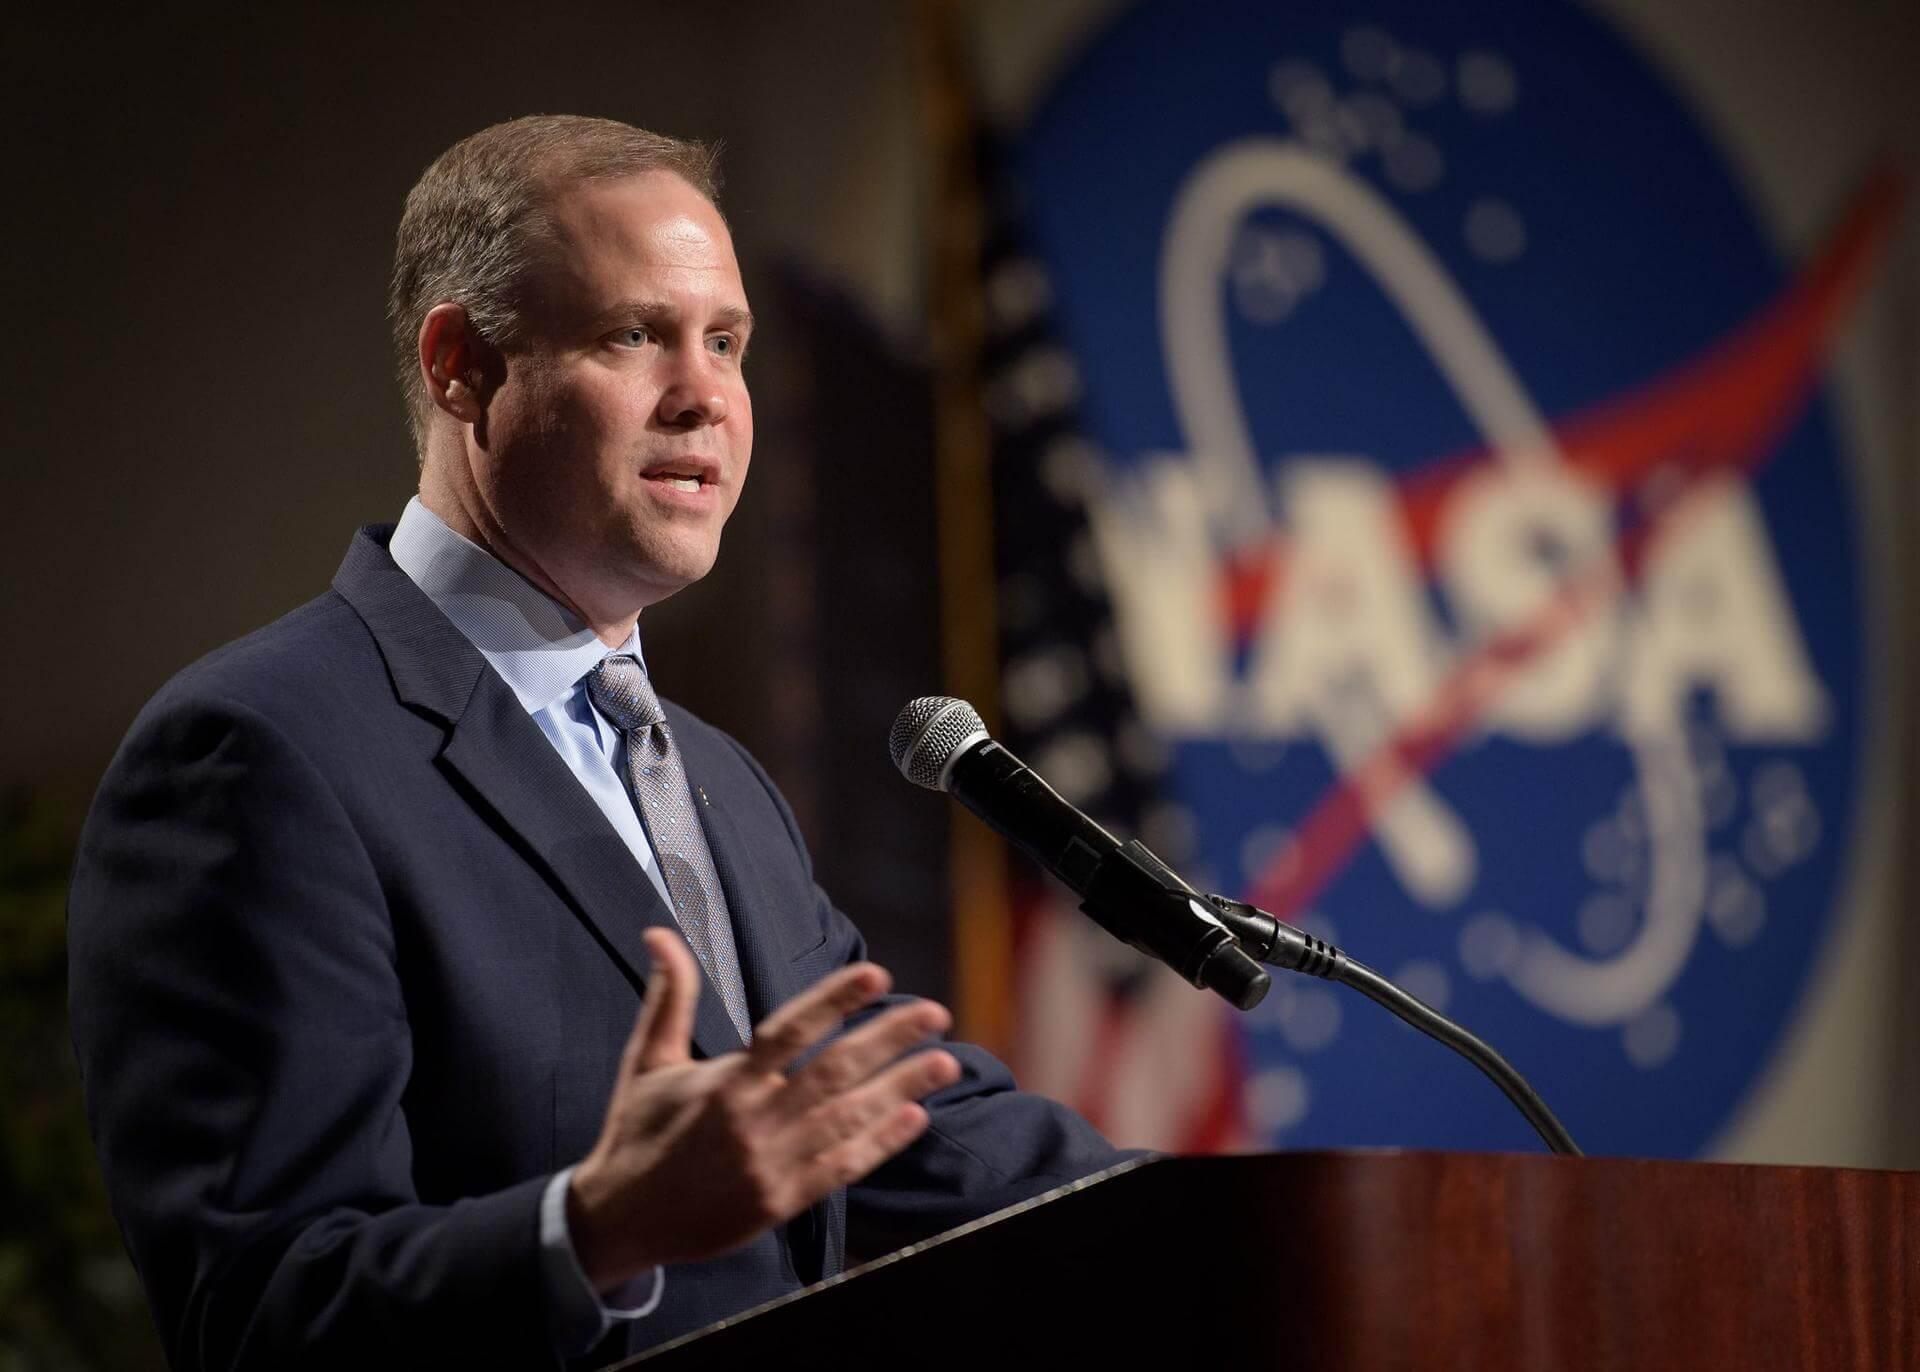 Jim Bridenstine at the 2020 Mars Society Convention